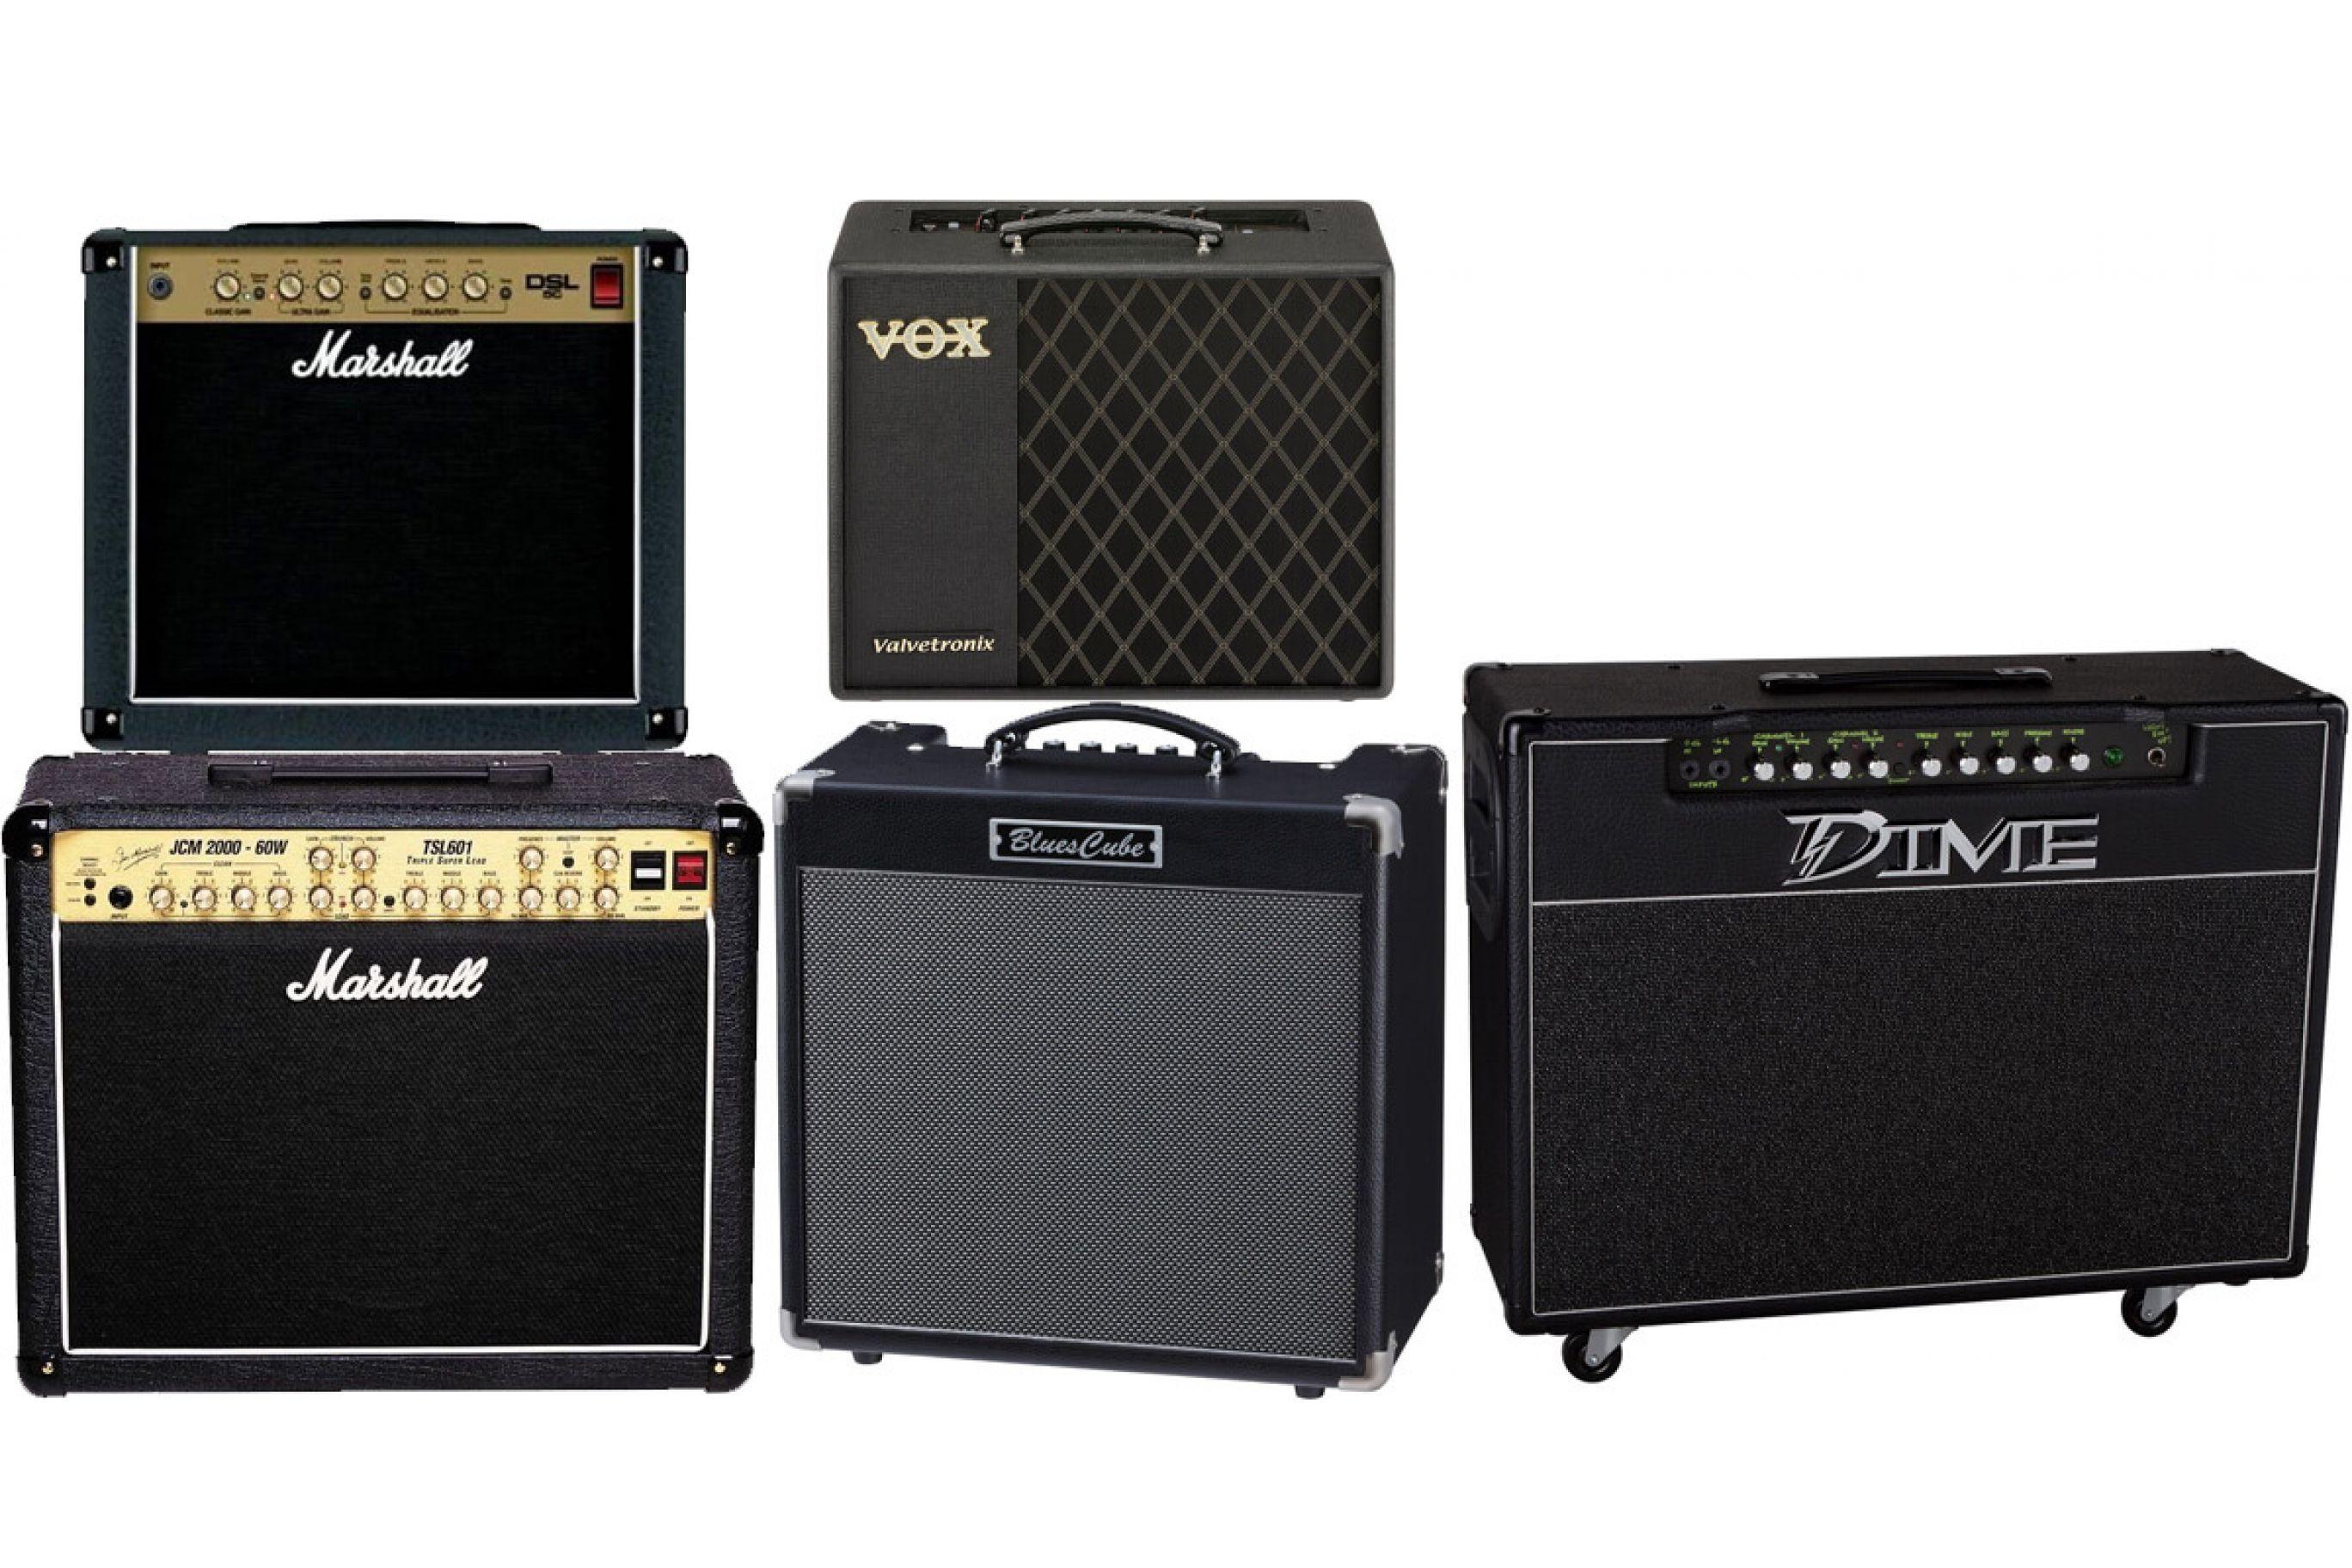 I migliori amplificatori per chitarra elettrica musical store 2005